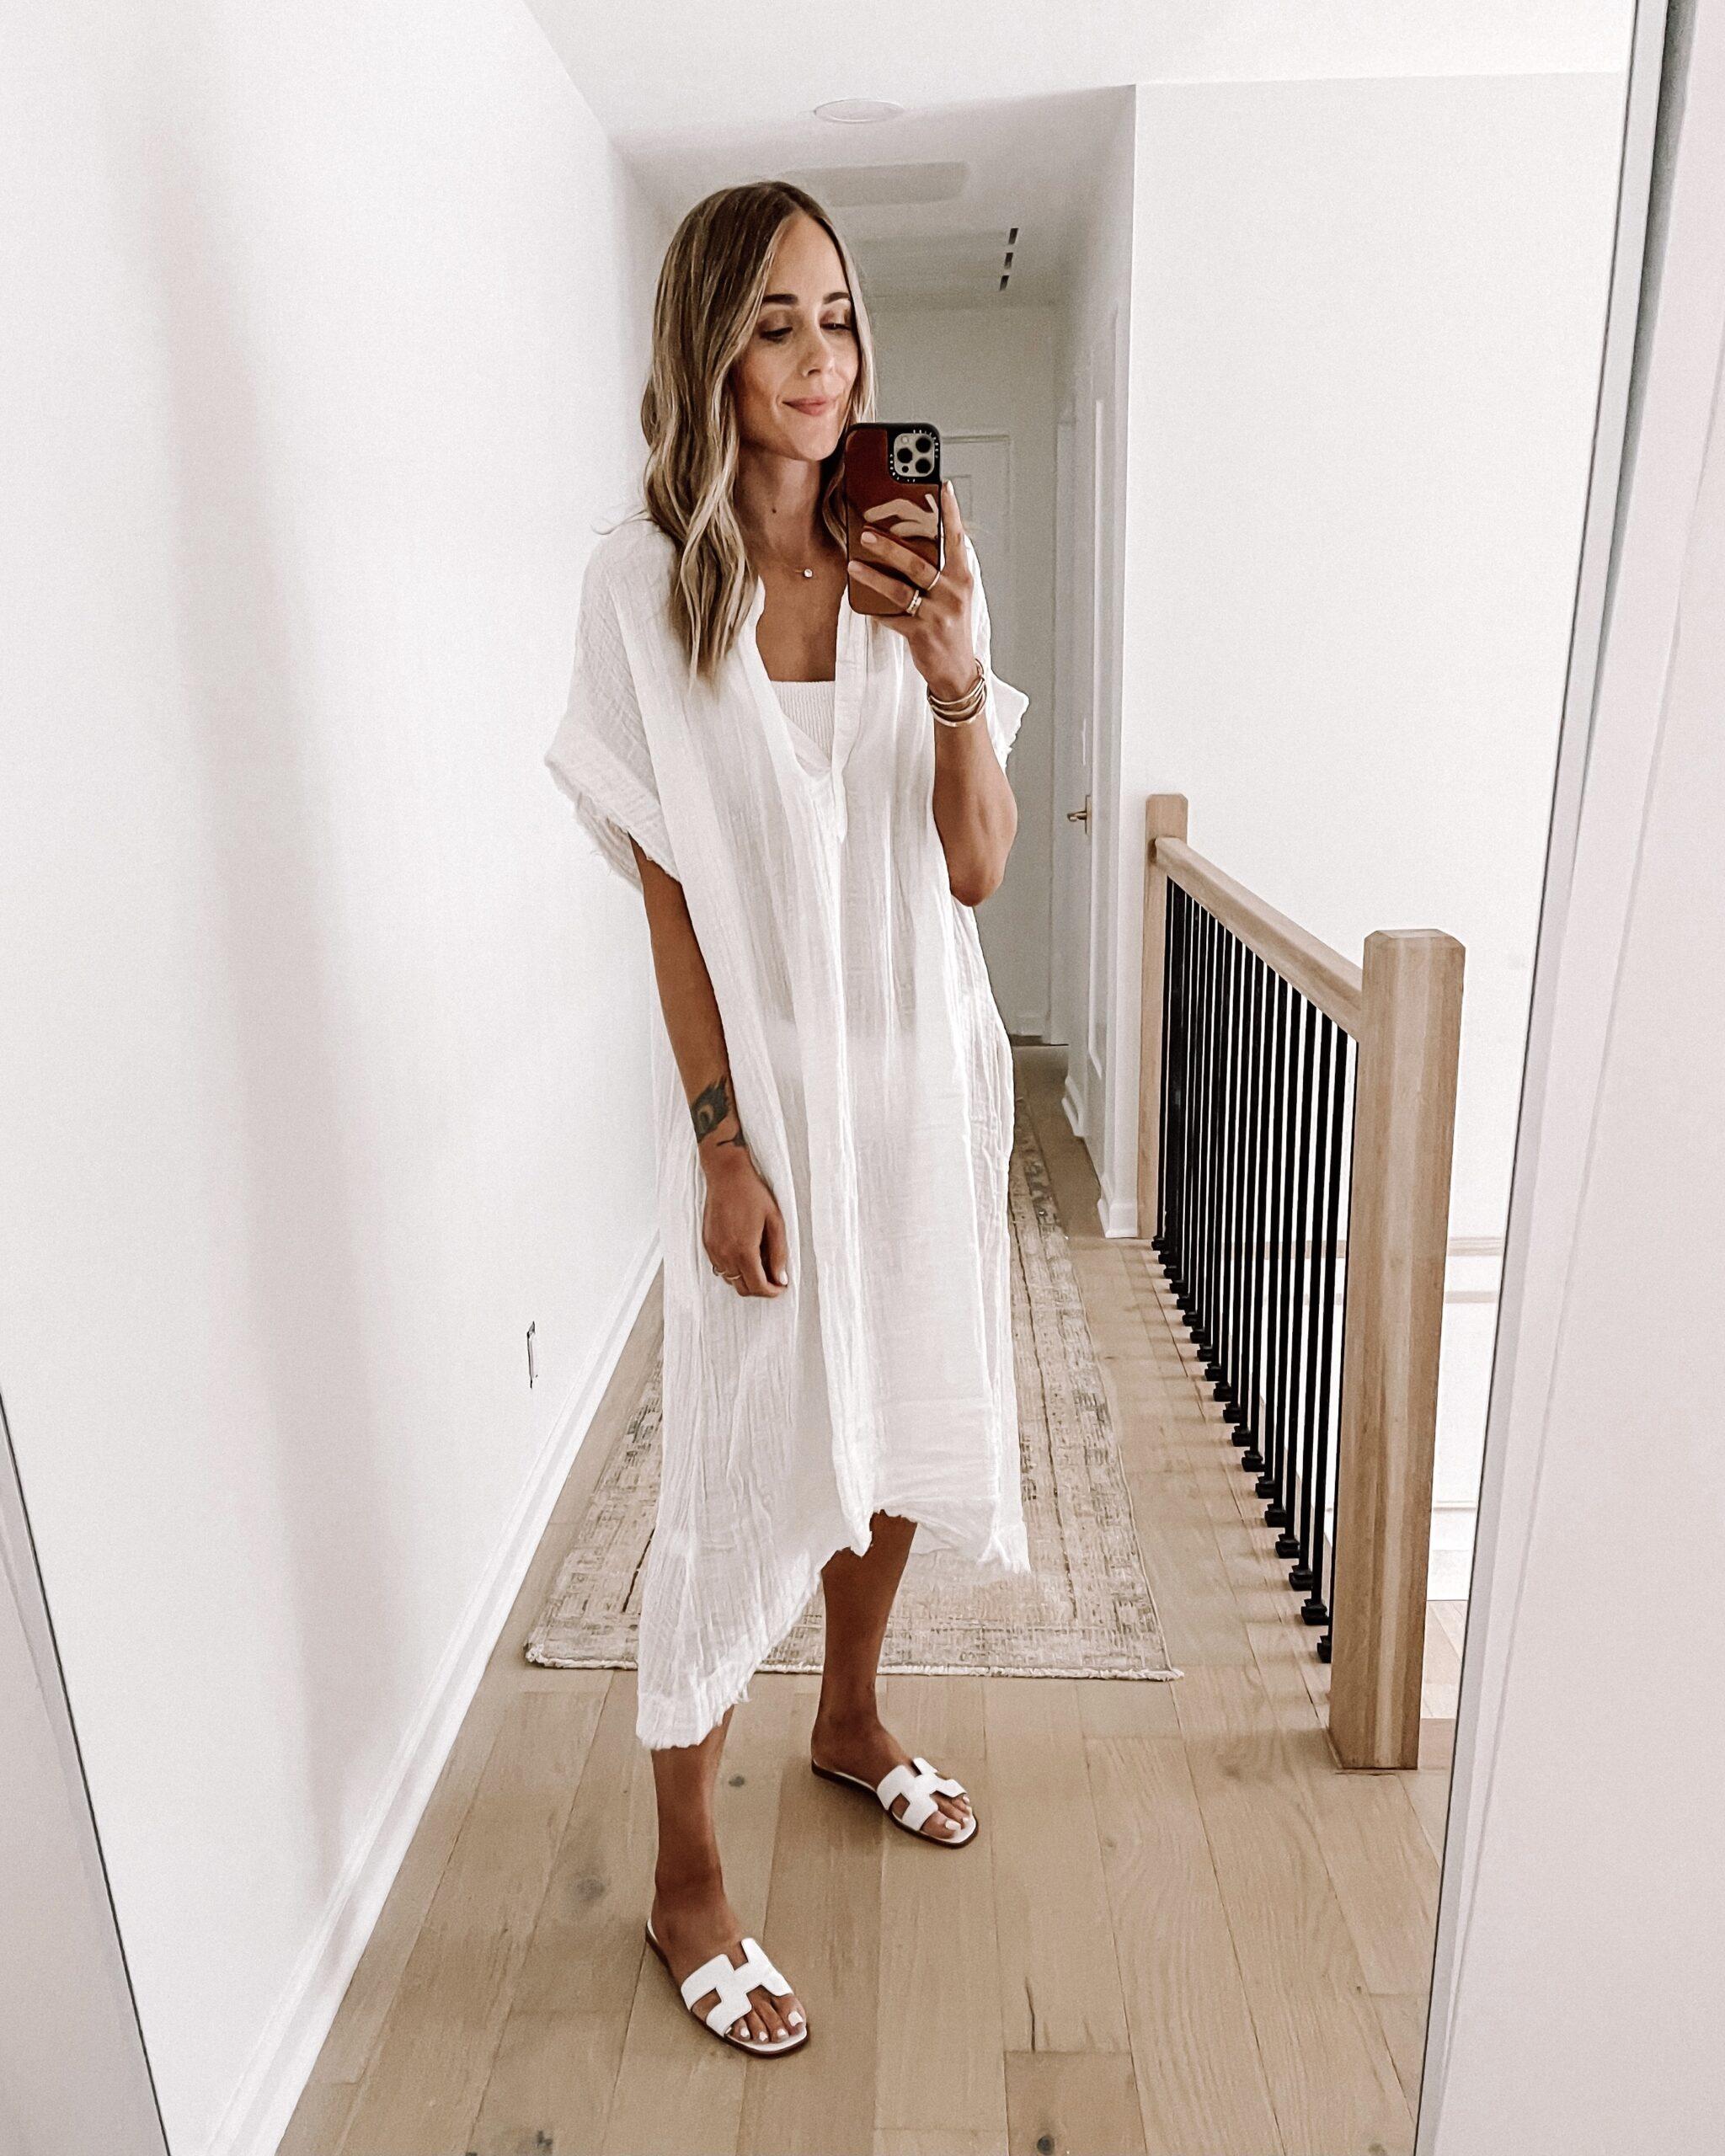 Fashion Jackson Wearing White Caftan Swimsuit Coverup White Hermes Sandals Shopbop Haul